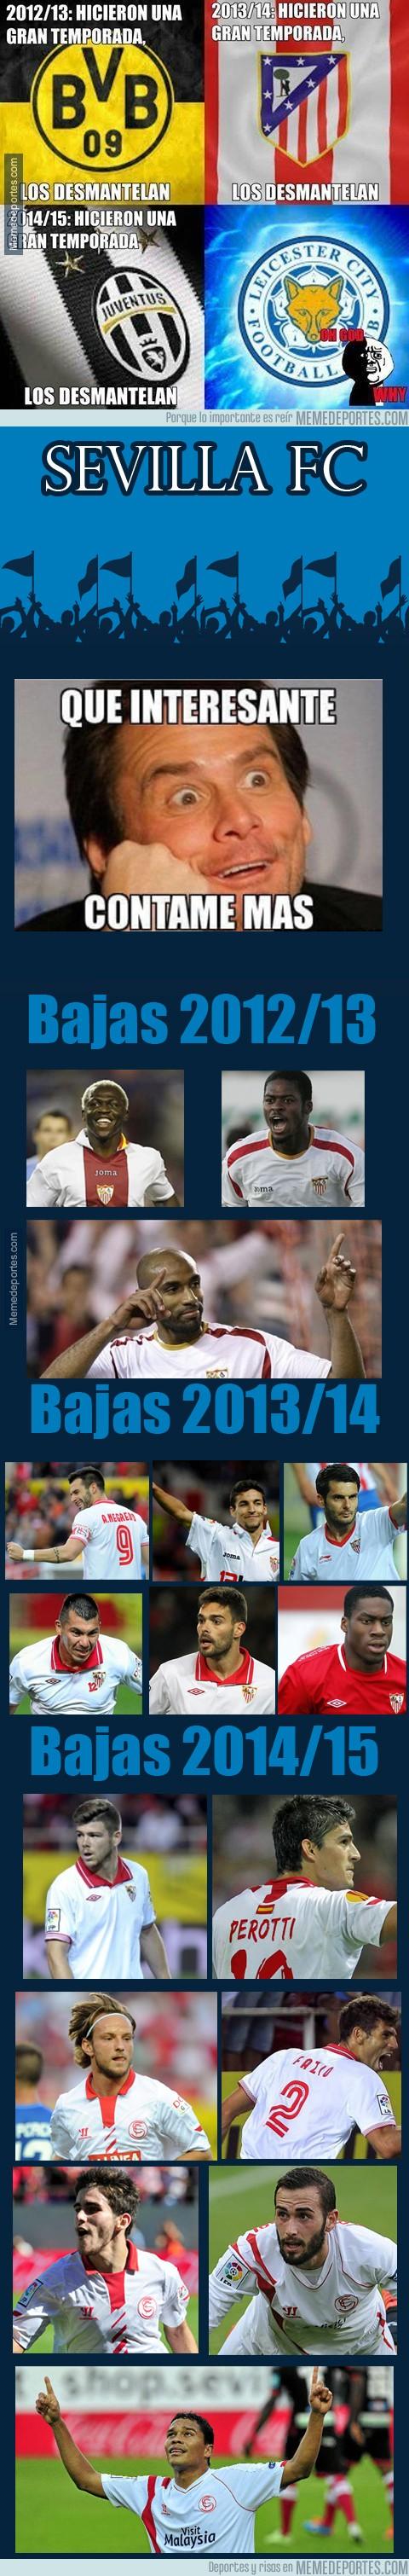 839129 - Al Sevilla FC no le impresiona